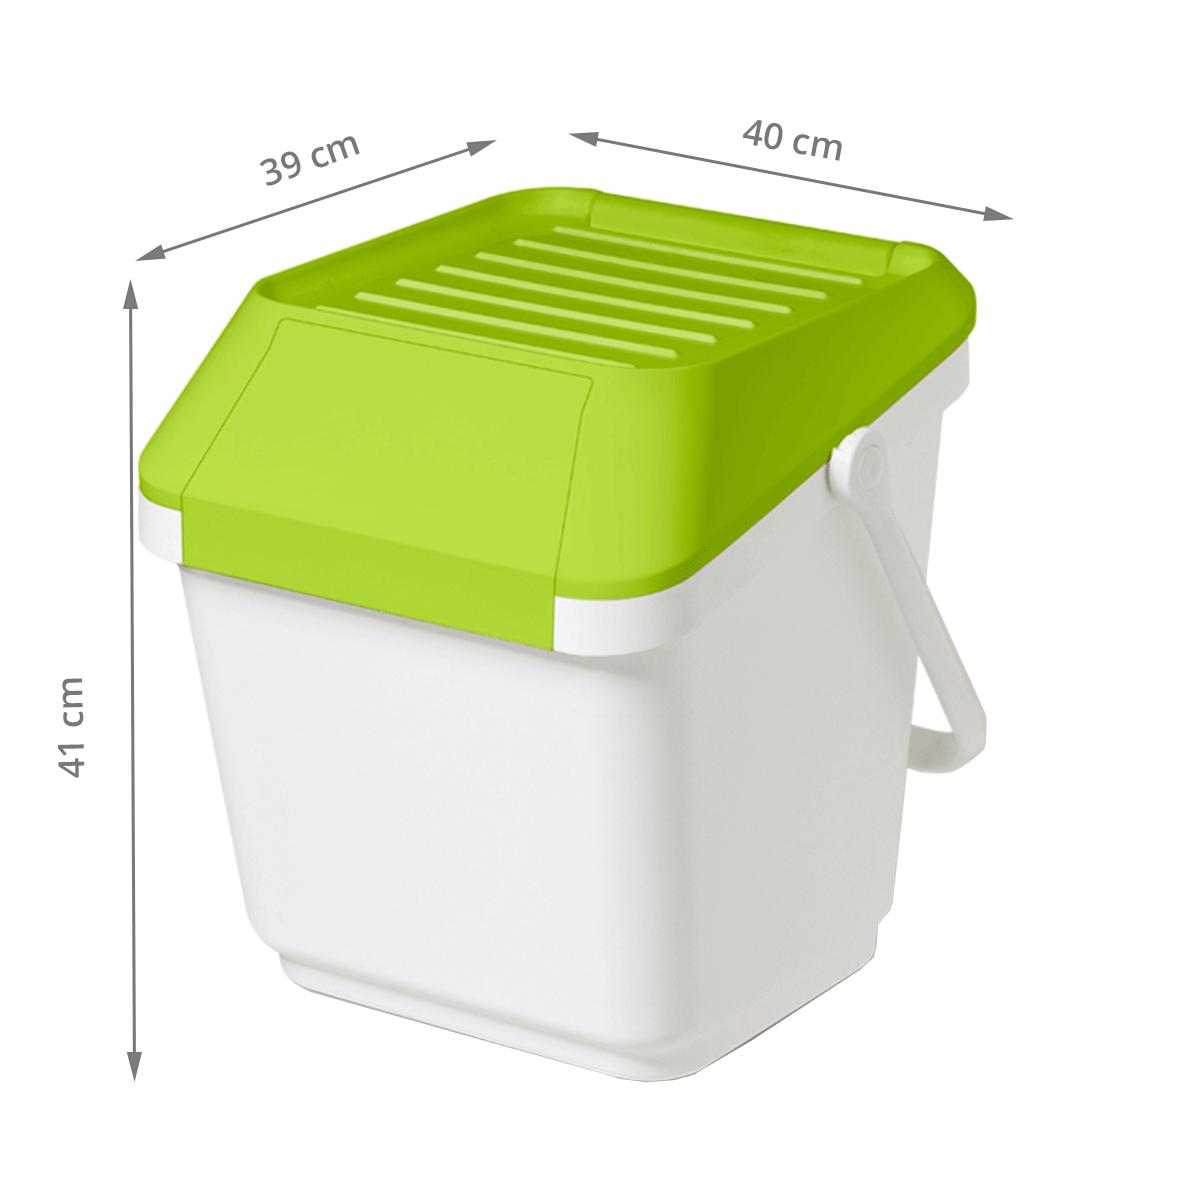 panier linge empilable plastique blanc et vert anis. Black Bedroom Furniture Sets. Home Design Ideas